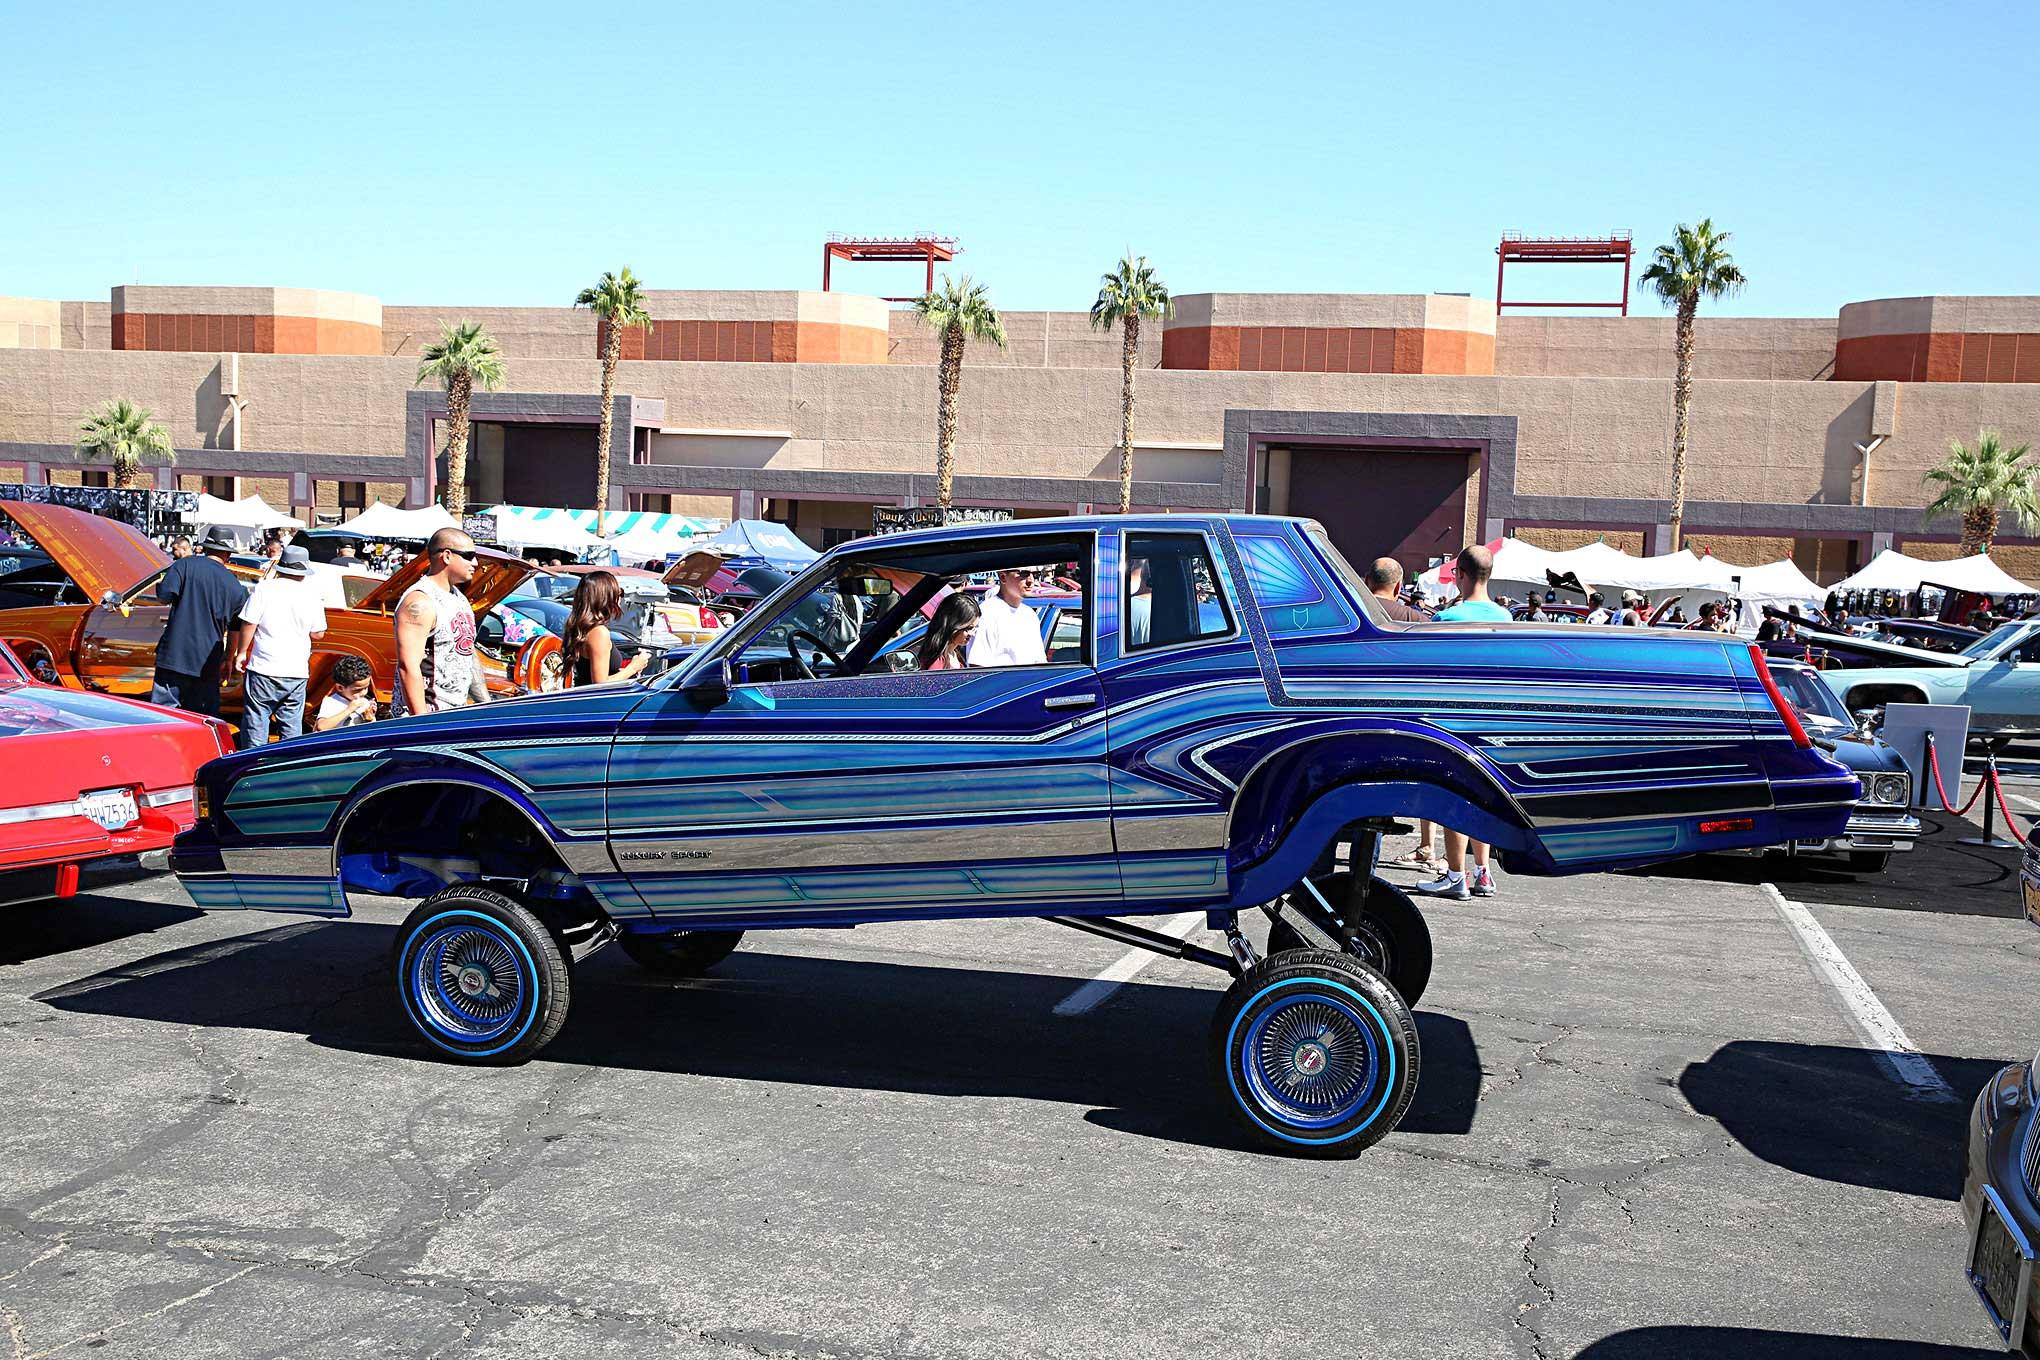 Las Vegas Super Show Patterned Blue Monte Carlo G Body